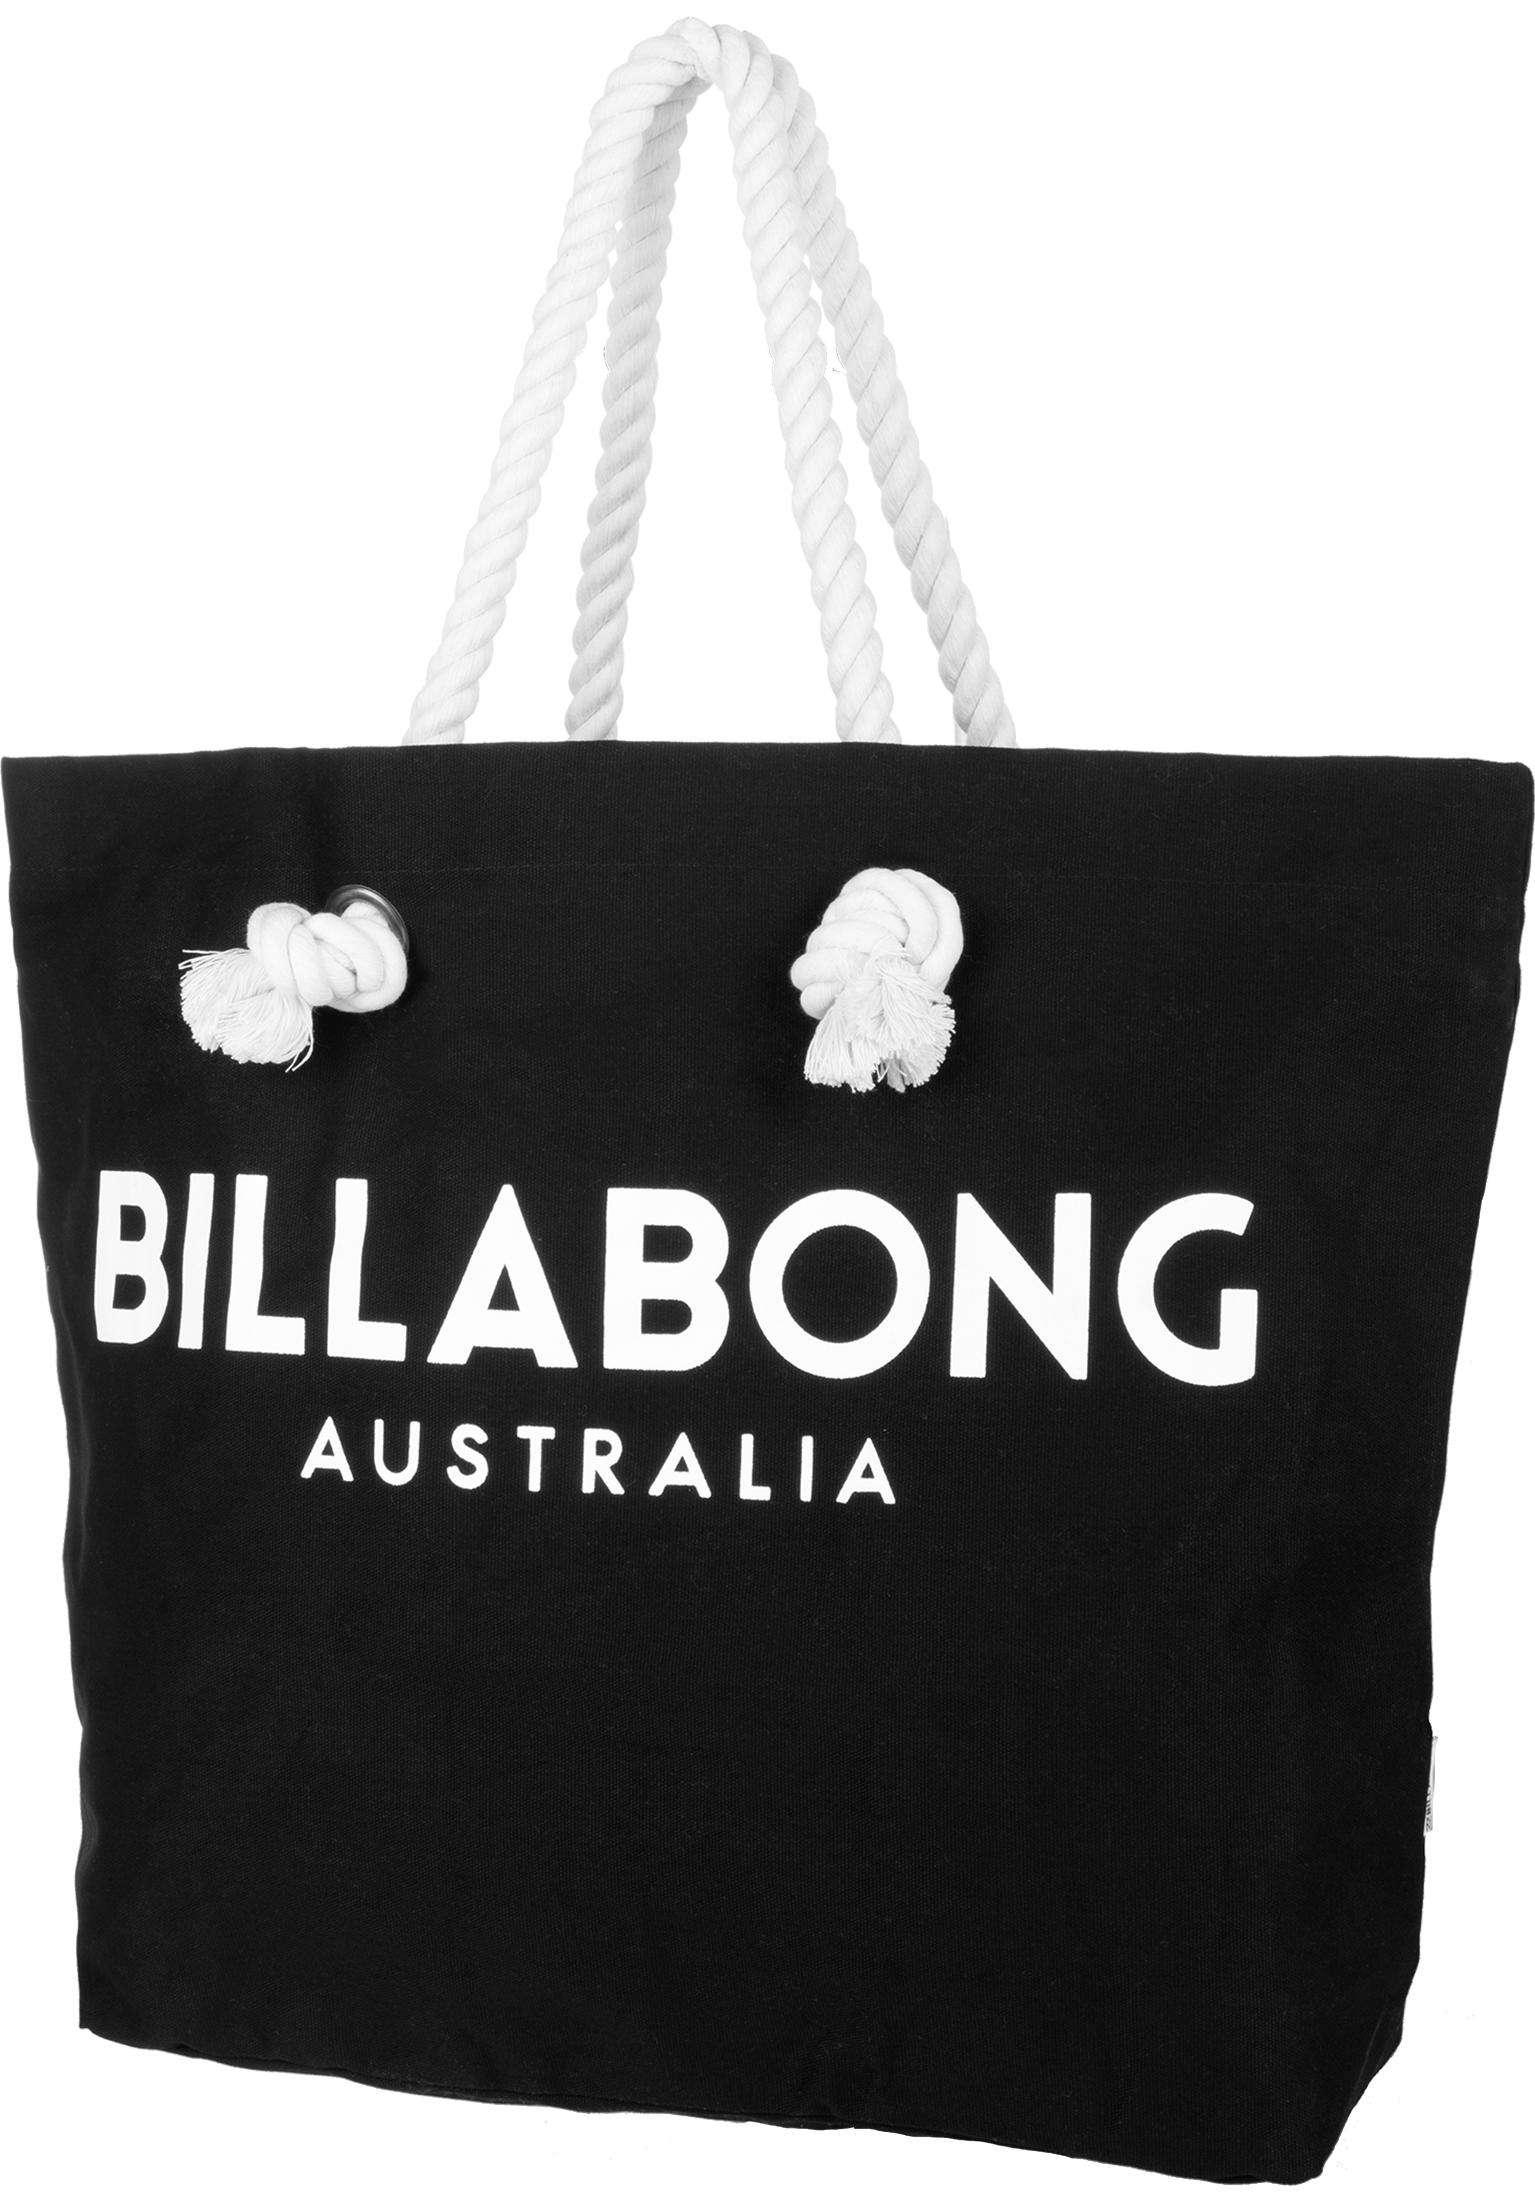 687b18bfa3a1 Essential Tote Billabong Bags in black for Women